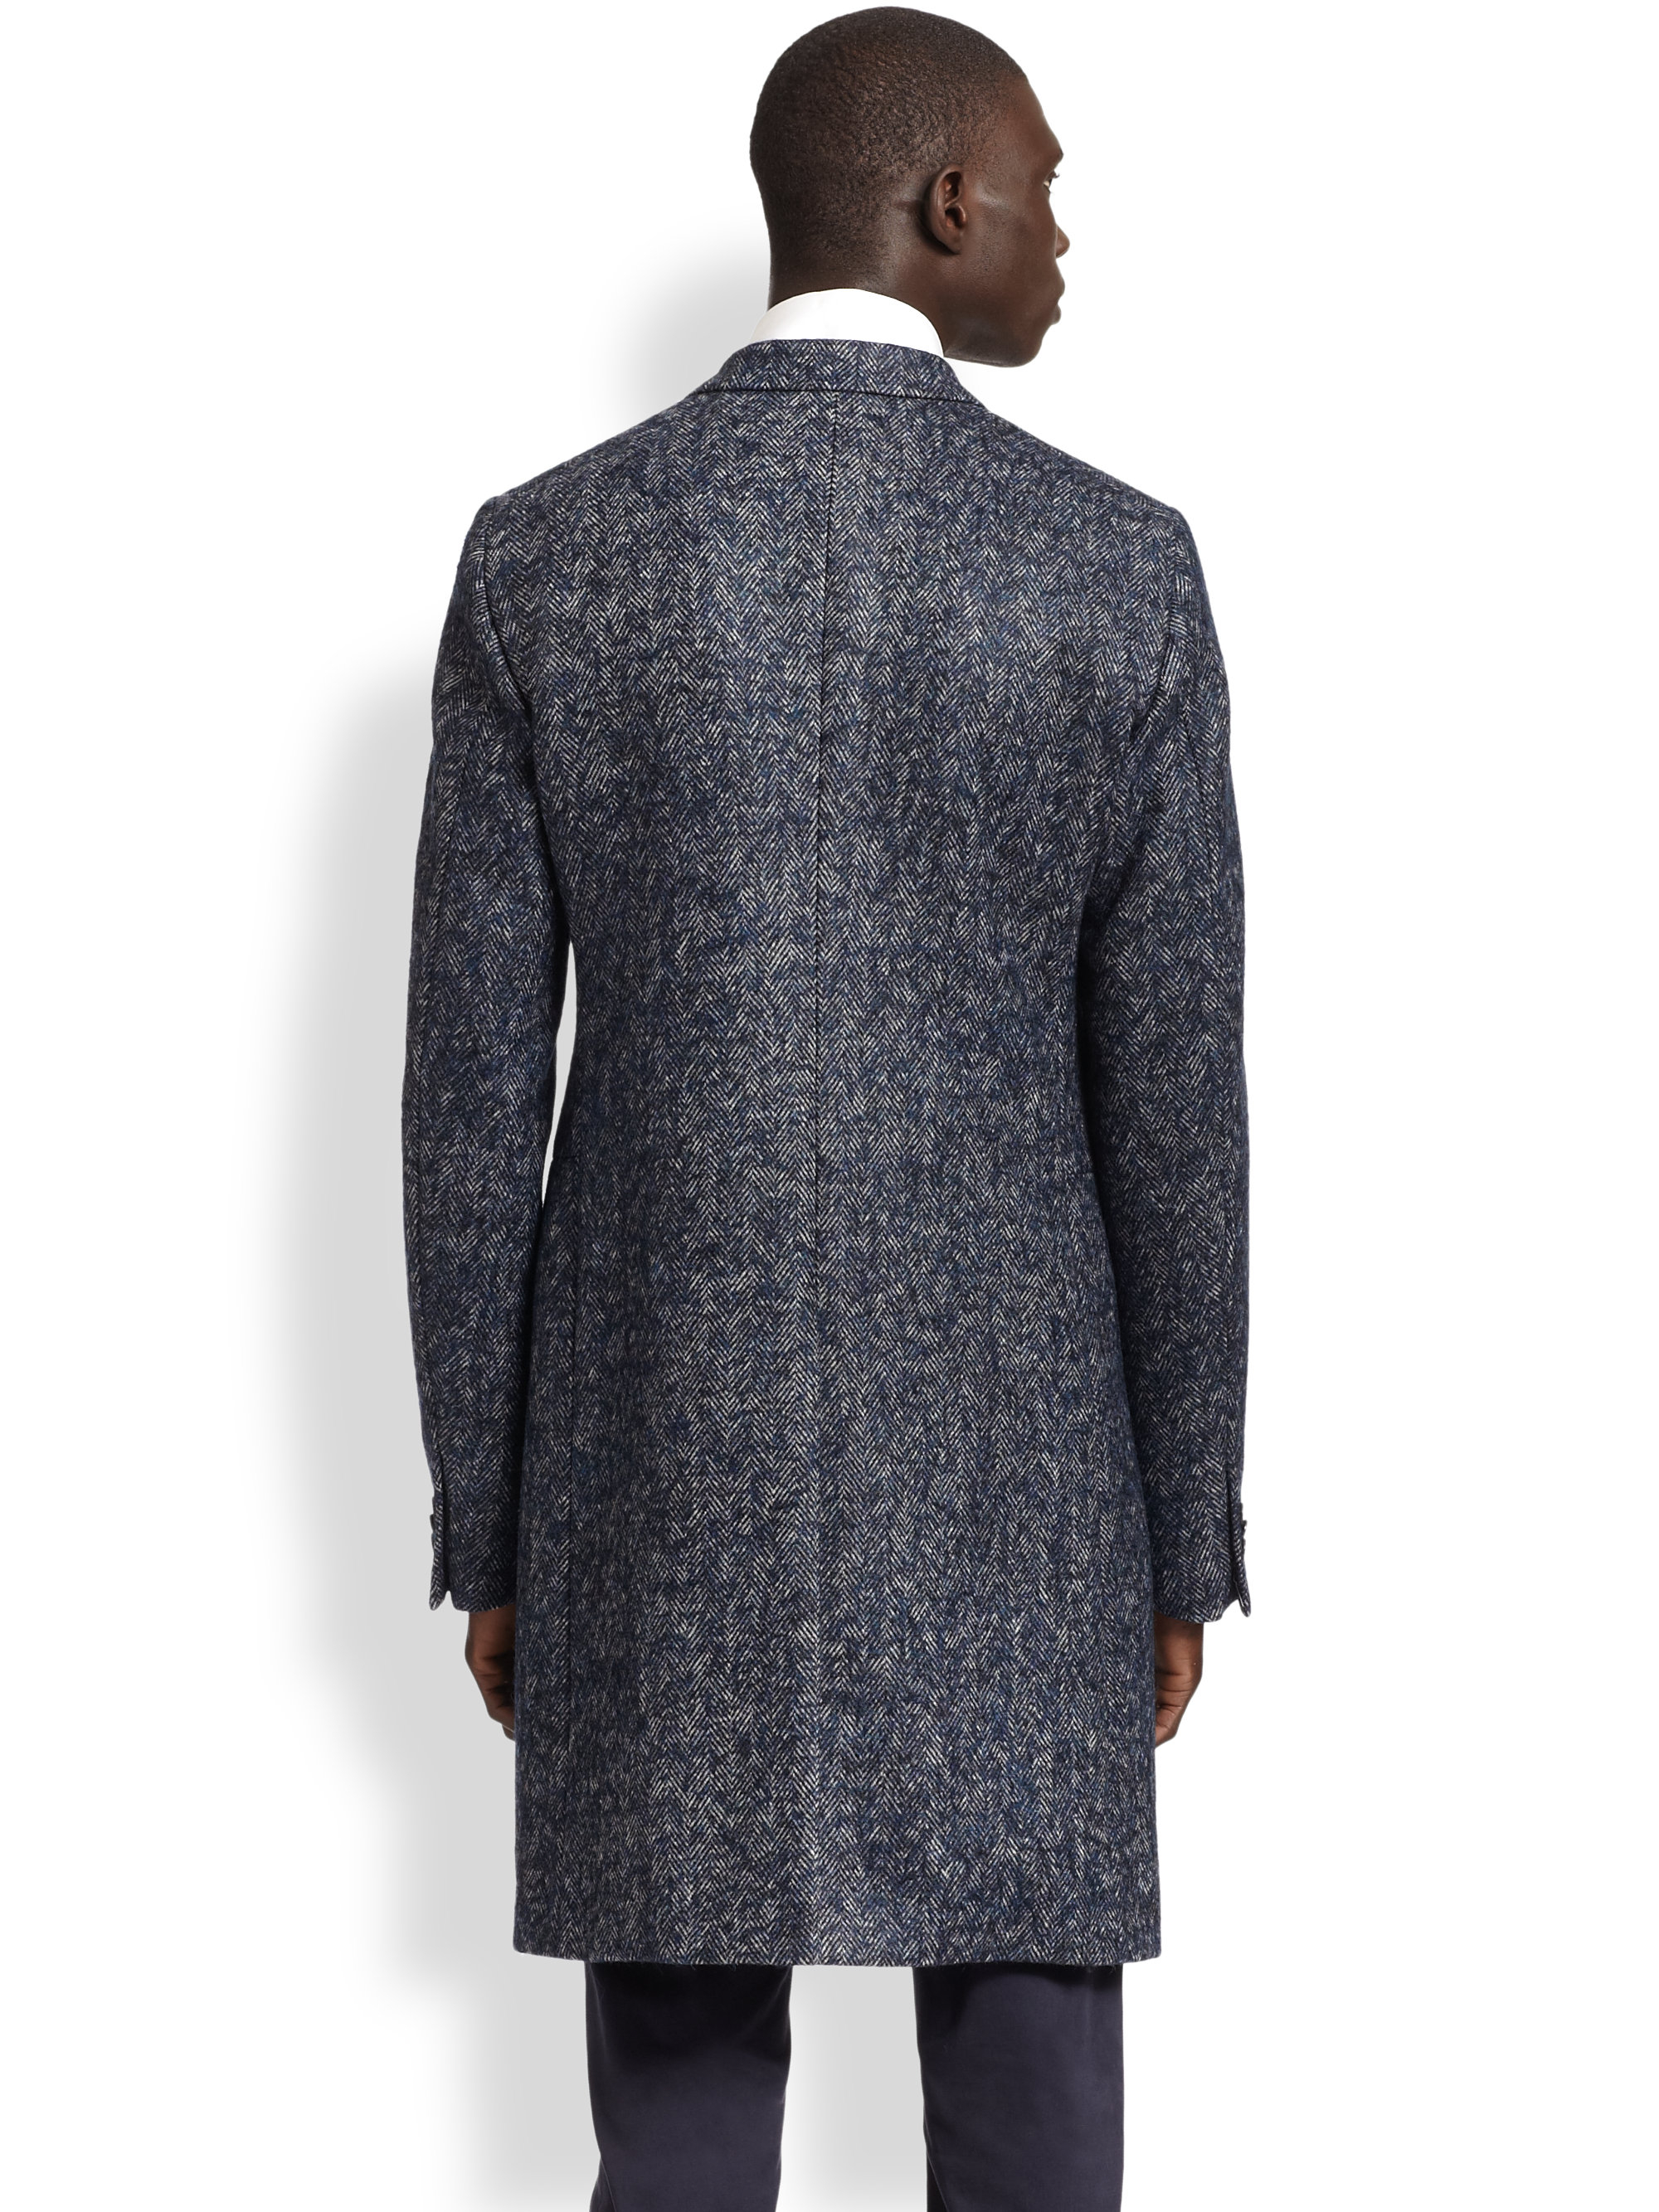 Jil sander Wool Herringbone Coat in Blue for Men | Lyst